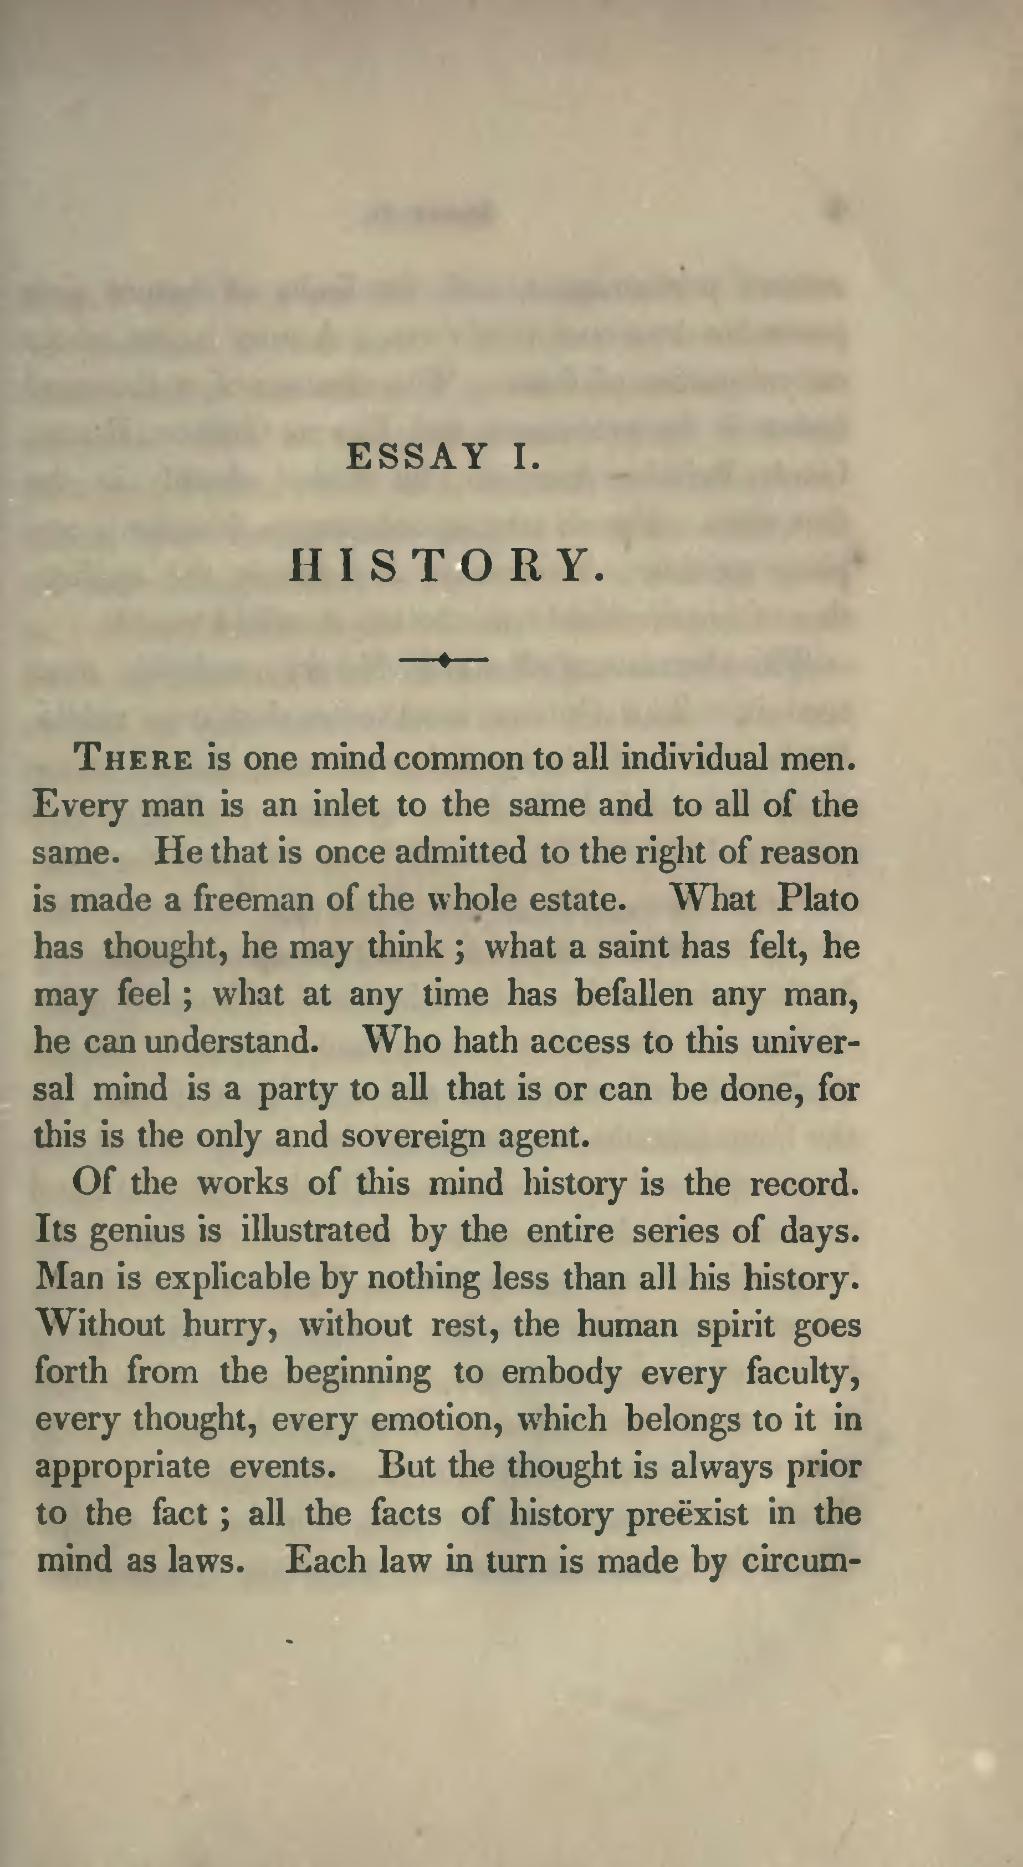 011 Essays First Series Page15 1024px Essays2c 28184729 Djvu Essay Stunning Emerson Pdf Shelburne Publisher Full